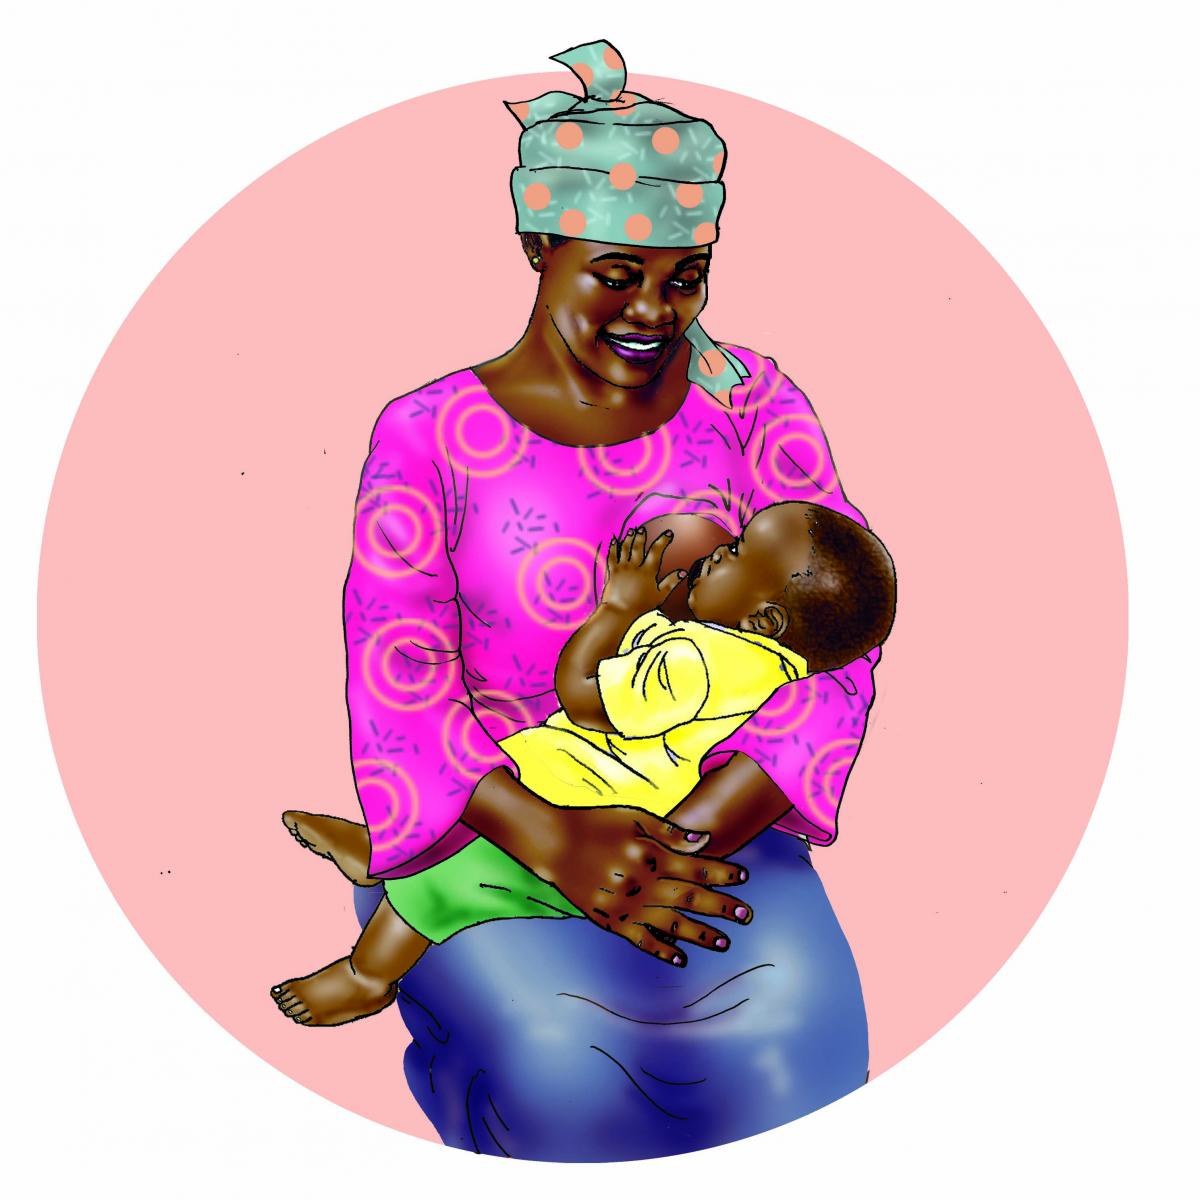 Breastfeeding - Exclusive breastfeeding 6-9 mo - 00B - Benin